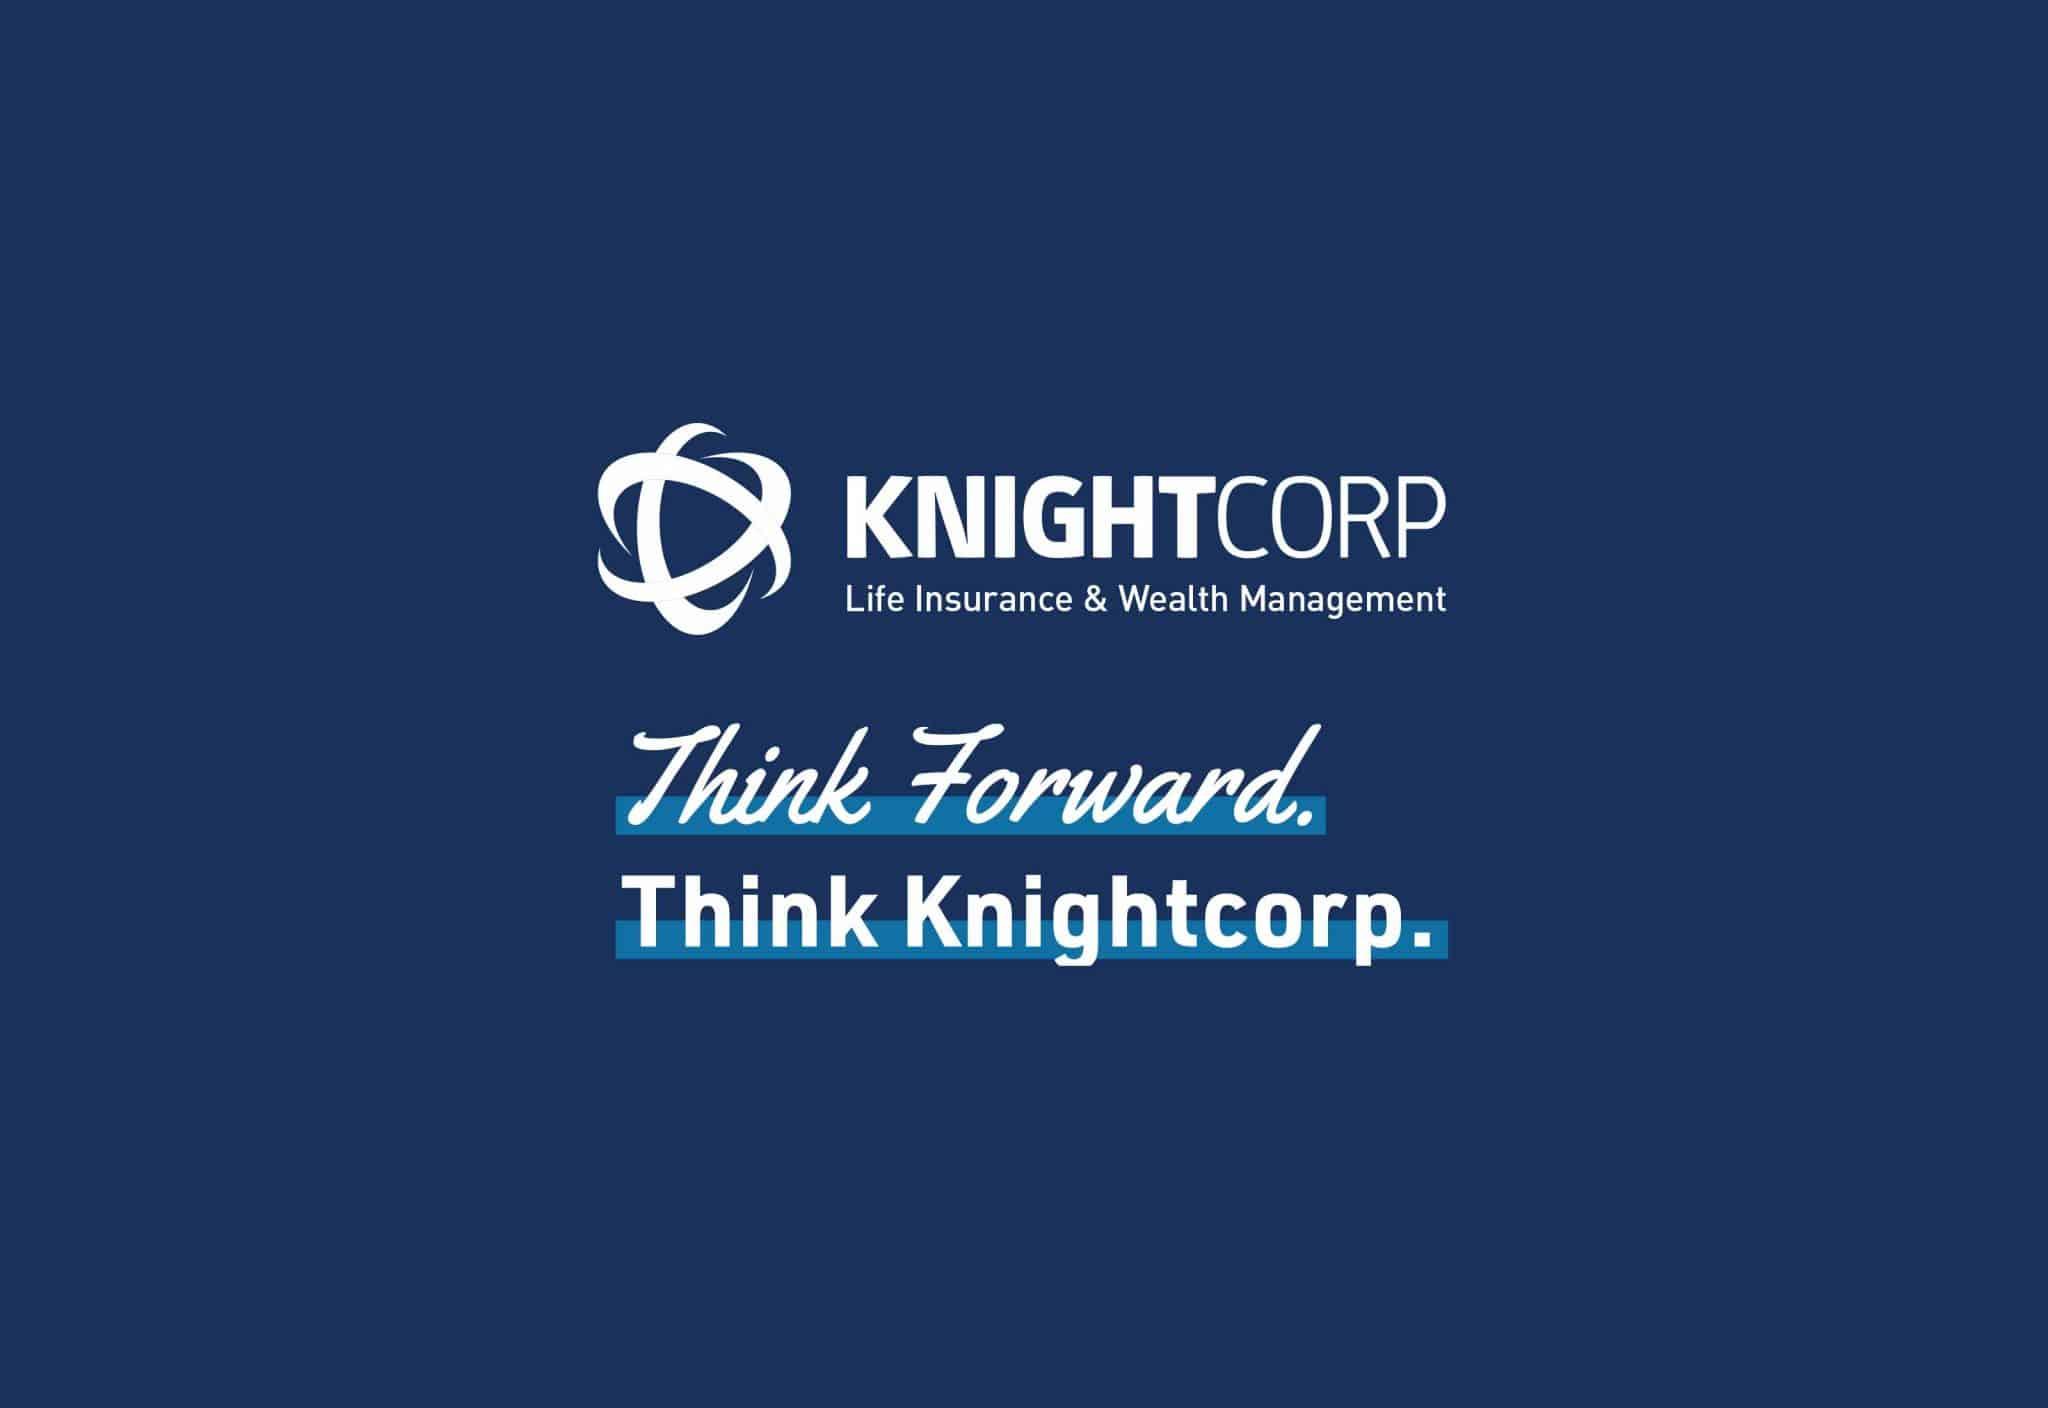 5 4S Work Knightcorp LIWM Logo